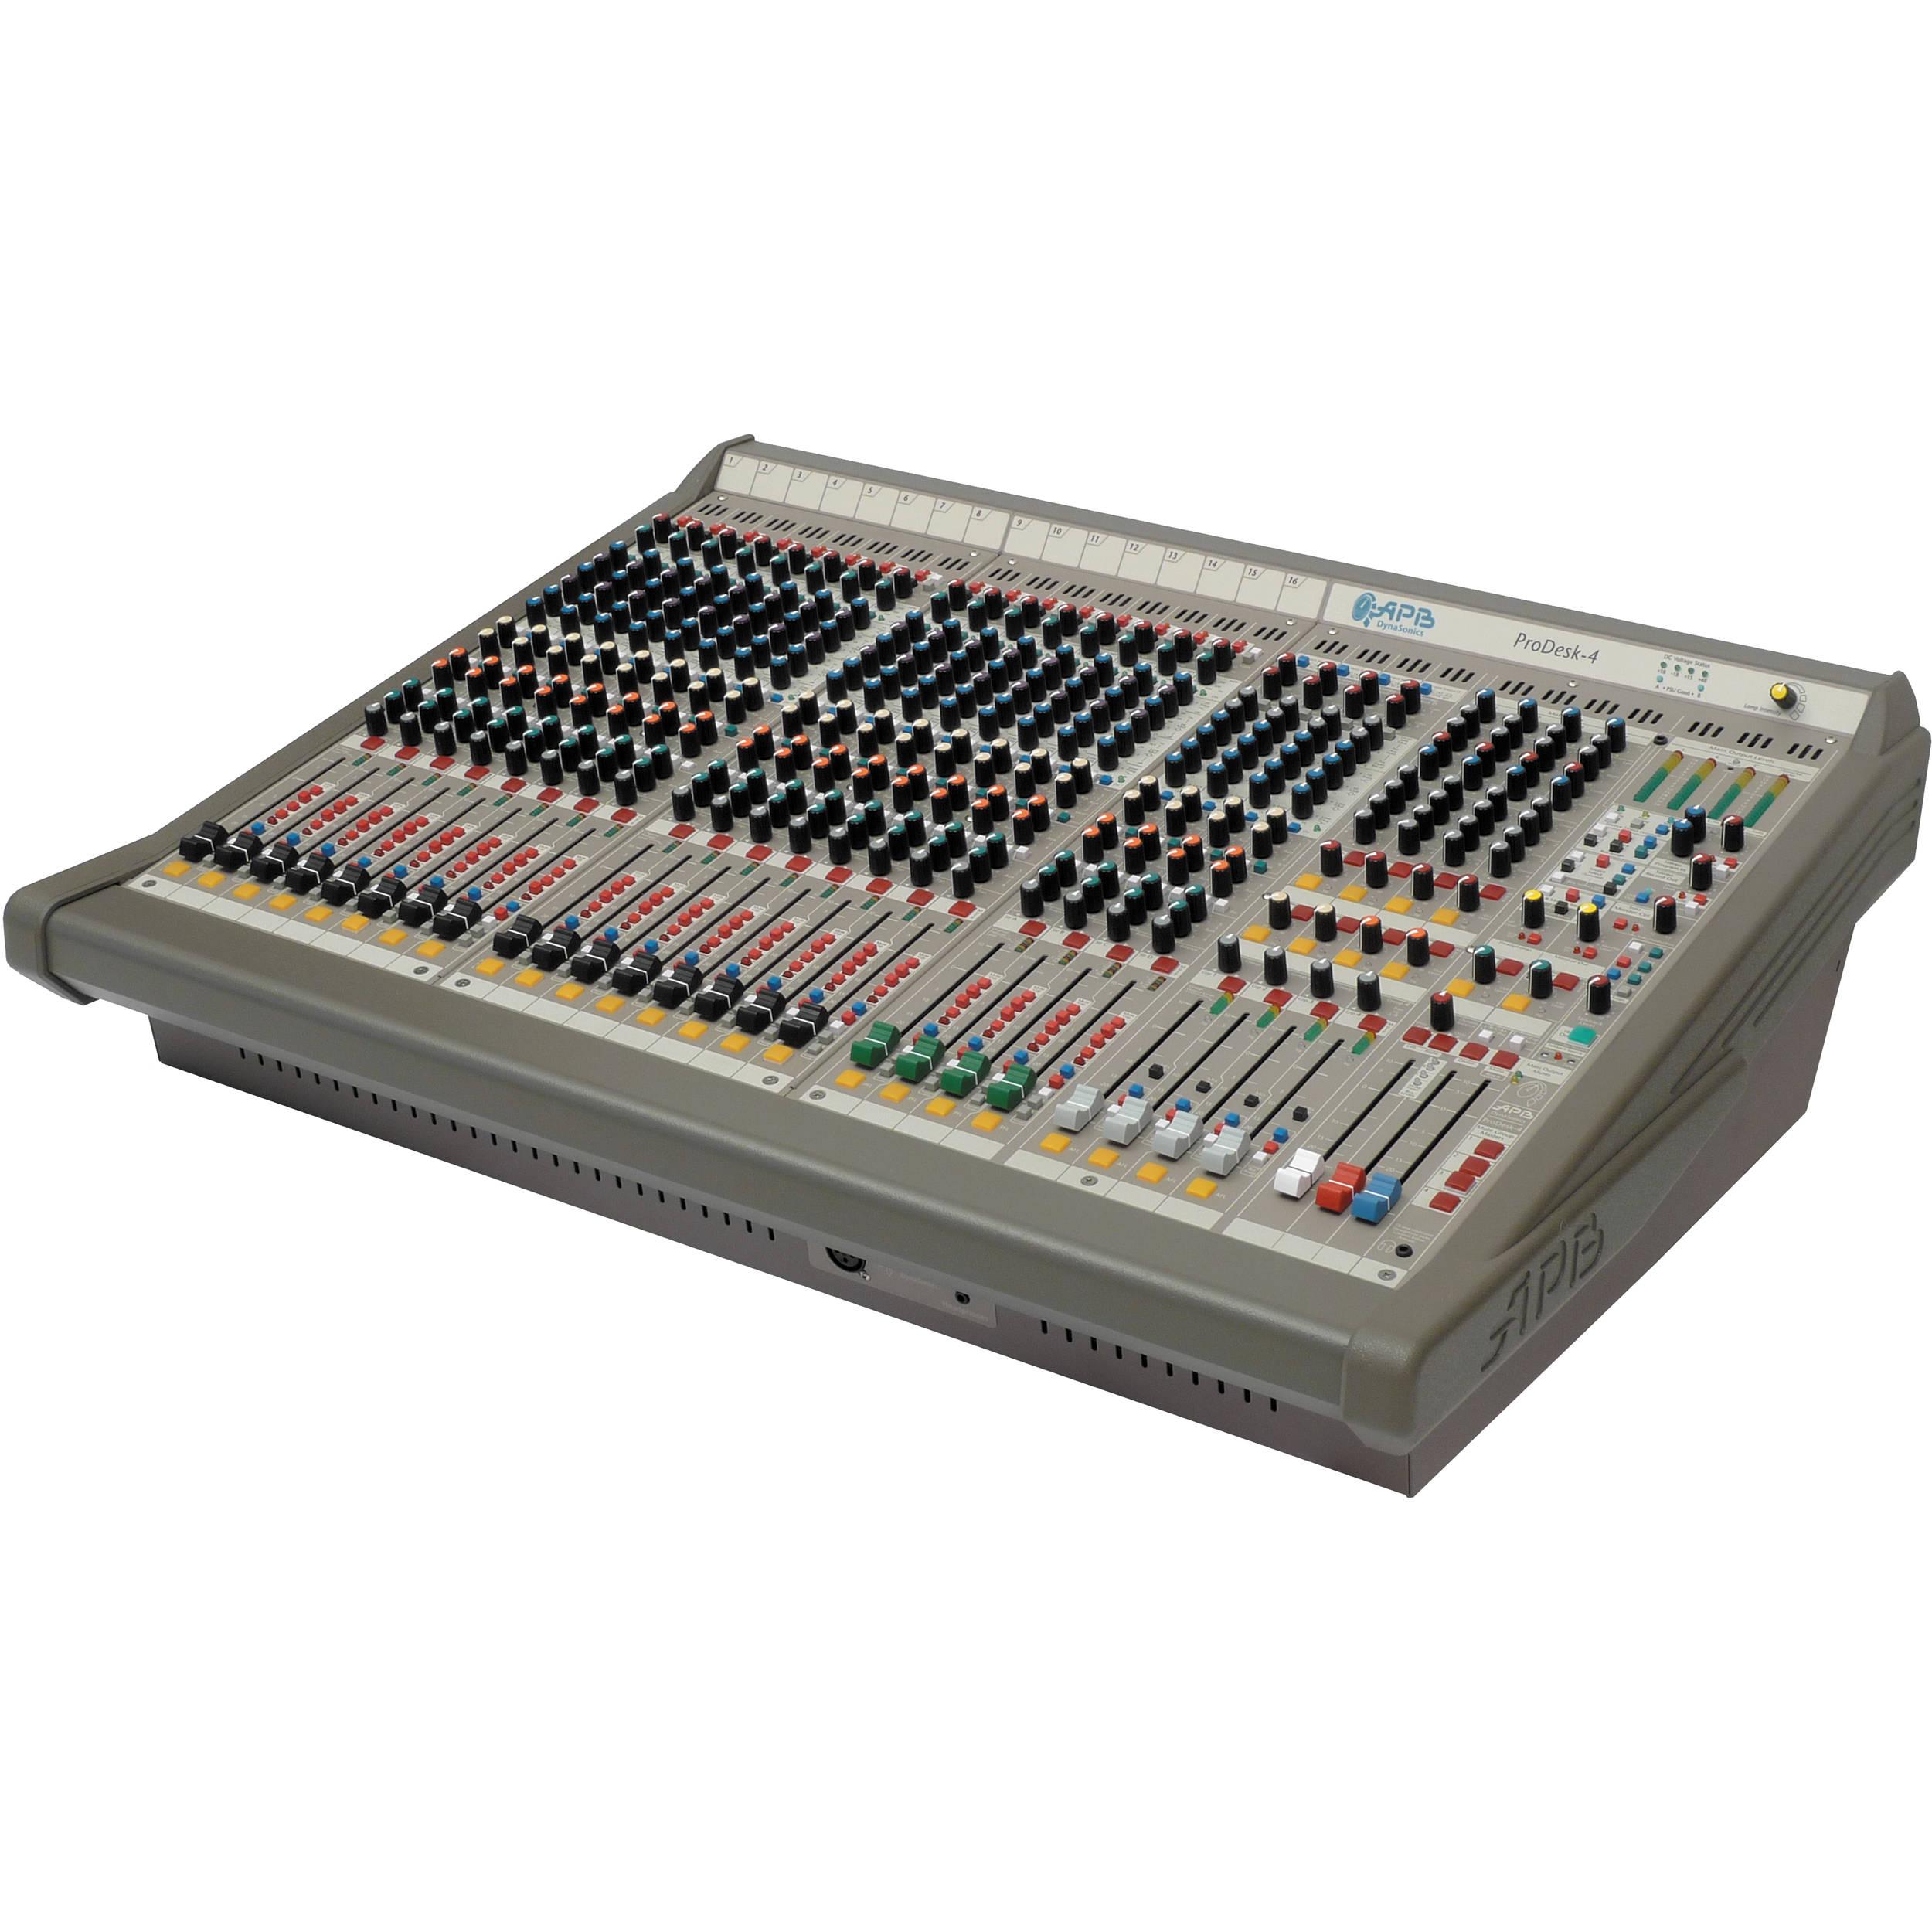 Apb Dynasonics Prodesk 4 16 Input Foh Mixing Console